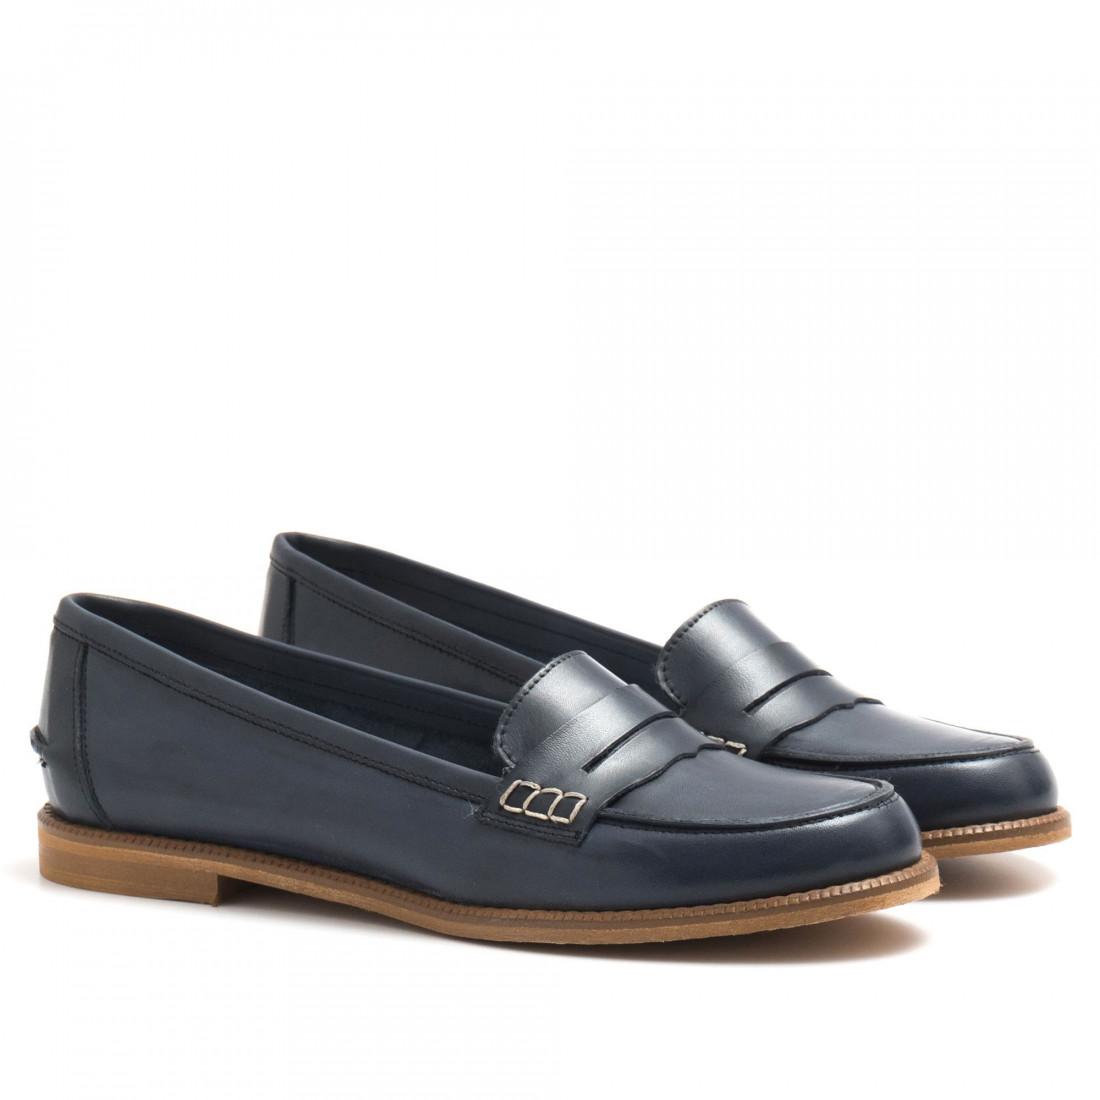 loafers woman sangiorgio 7340crust blu 4410